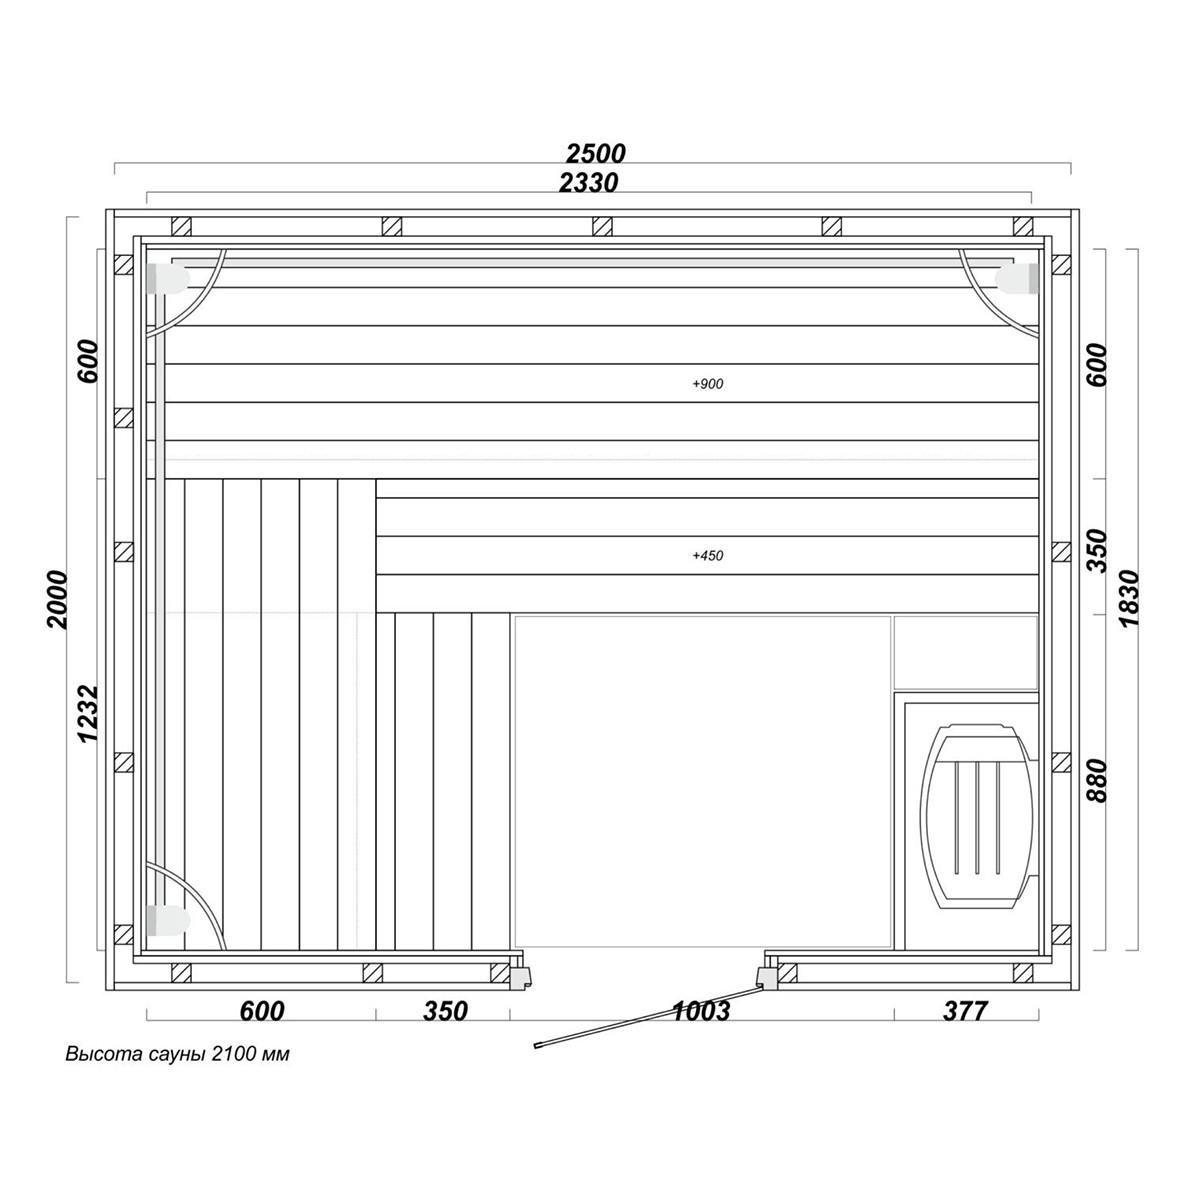 sauna6 - Проект сауны 2,5 Х 2,5 М